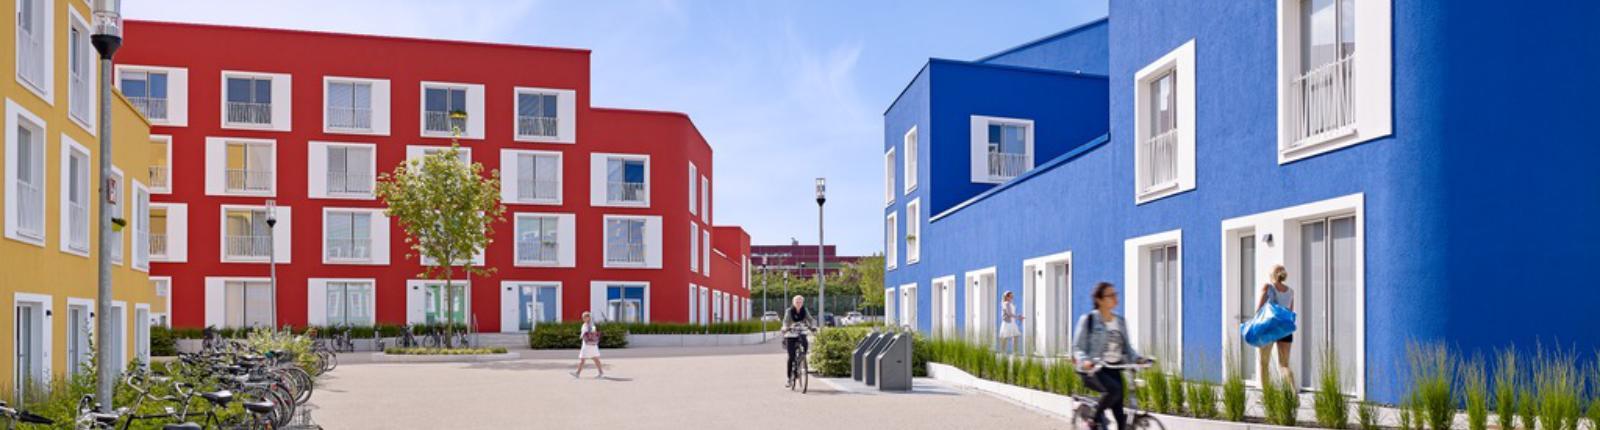 Funktionelle Fassadenfarbe Muller Sohn Frechen Koln